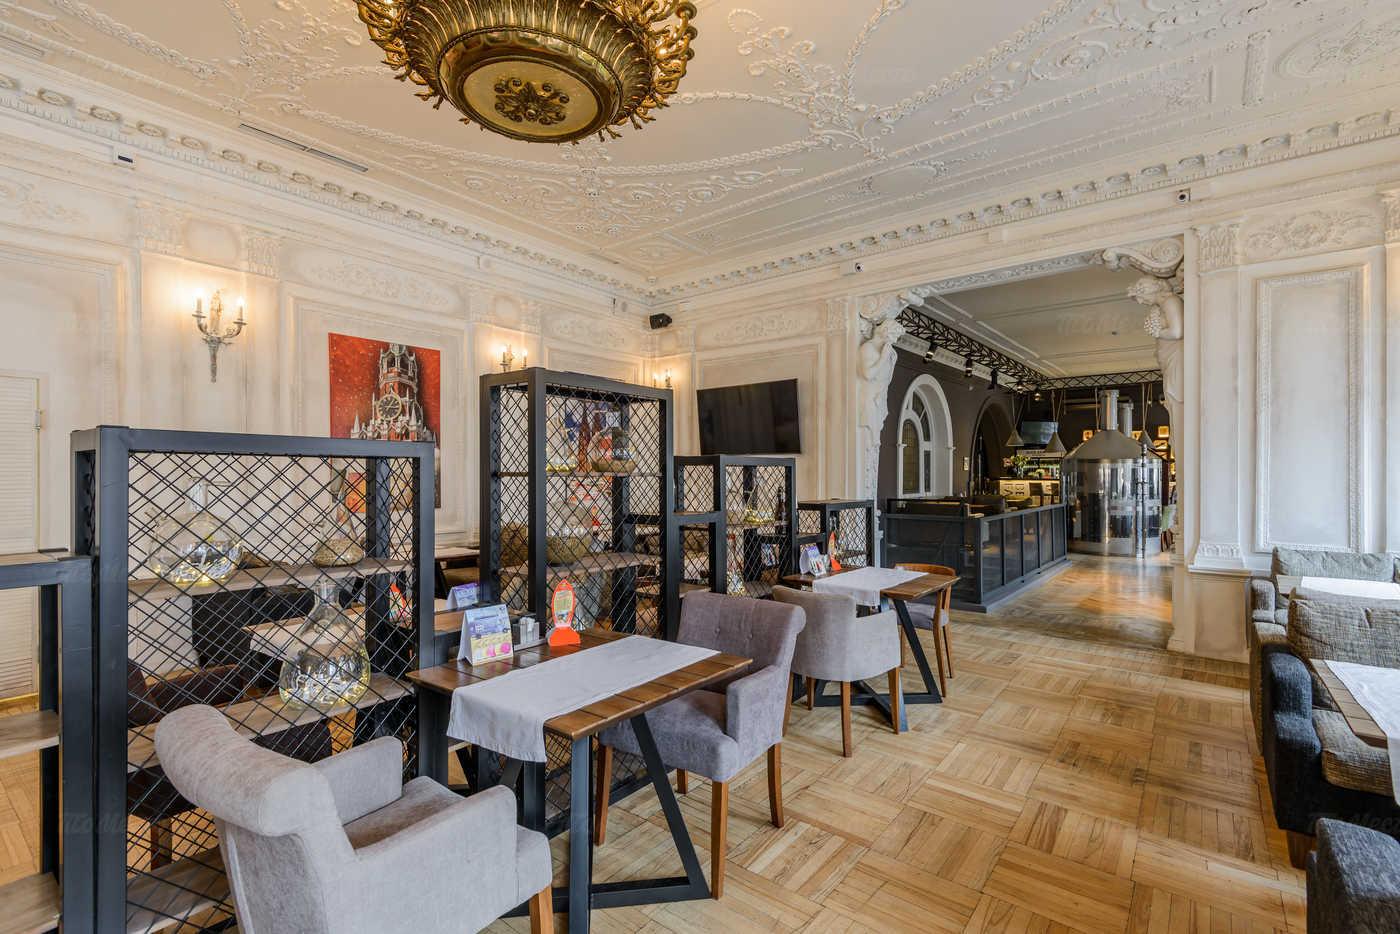 Ресторан Шато Винтаж (Chateau Vintage) на Невском проспекте фото 12